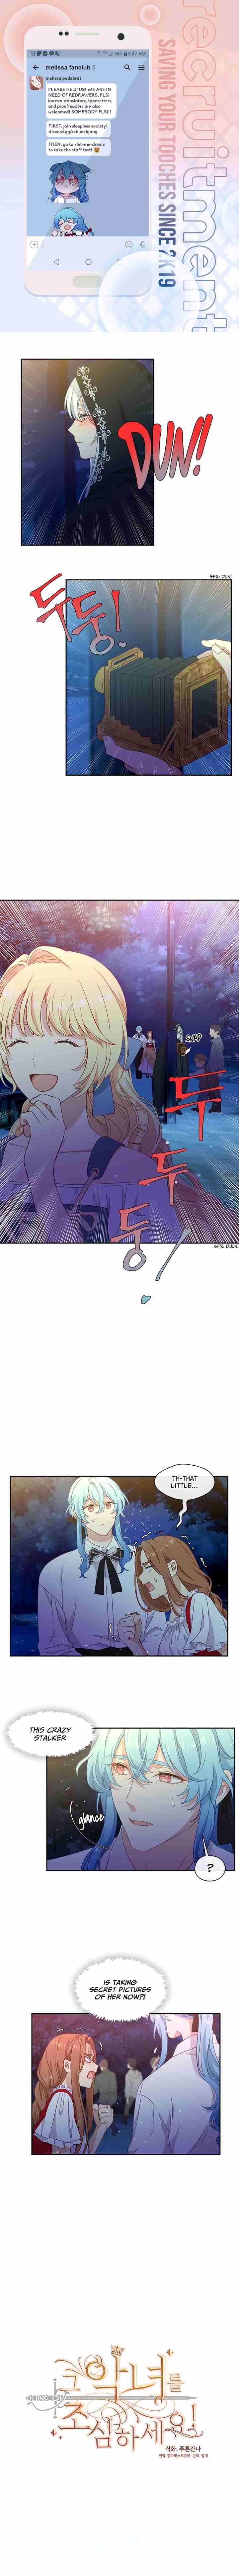 https://img2.nineanime.com/comics/pic4/1/36801/2191745/2760f1cc32d30840f01c43ee008fa1bd.jpg Page 1